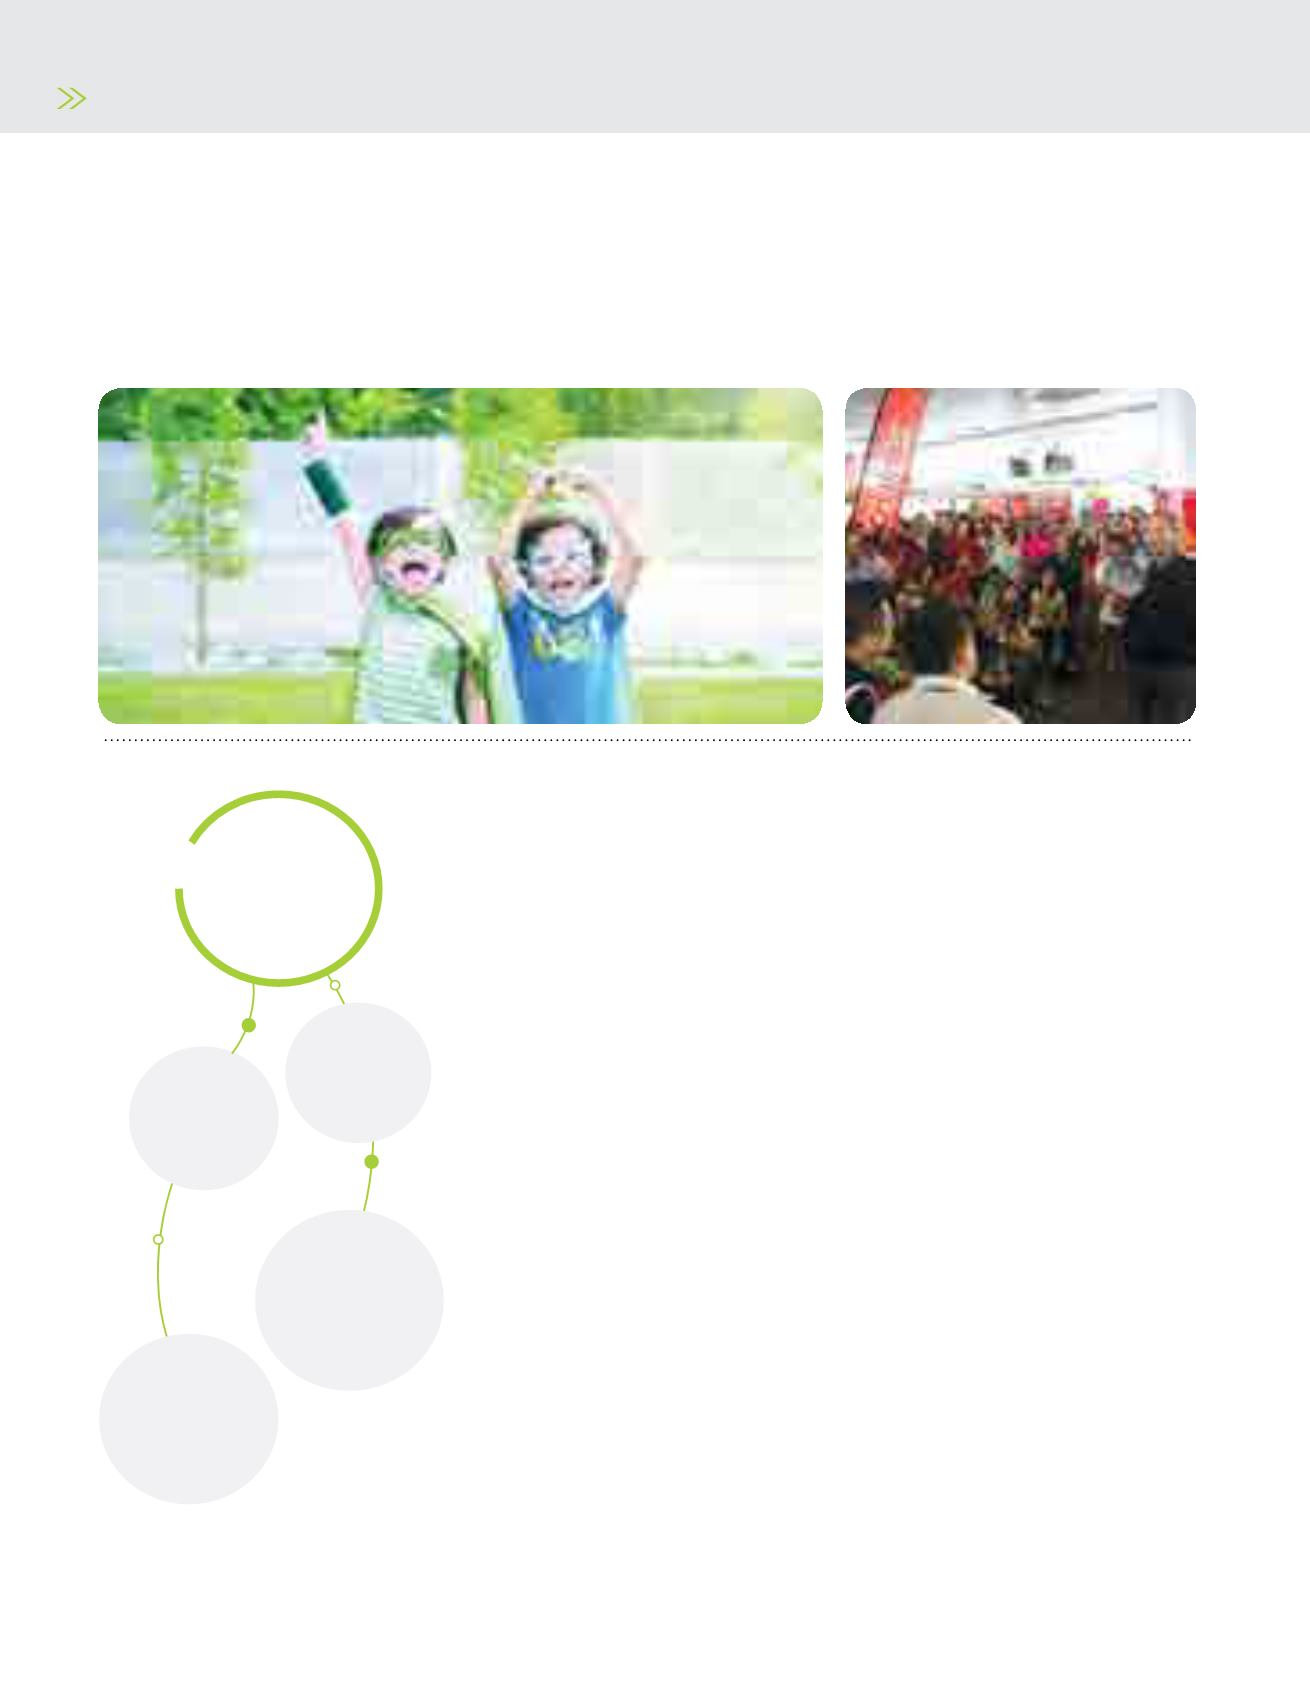 Maxis Berhad - Annual Report 2014